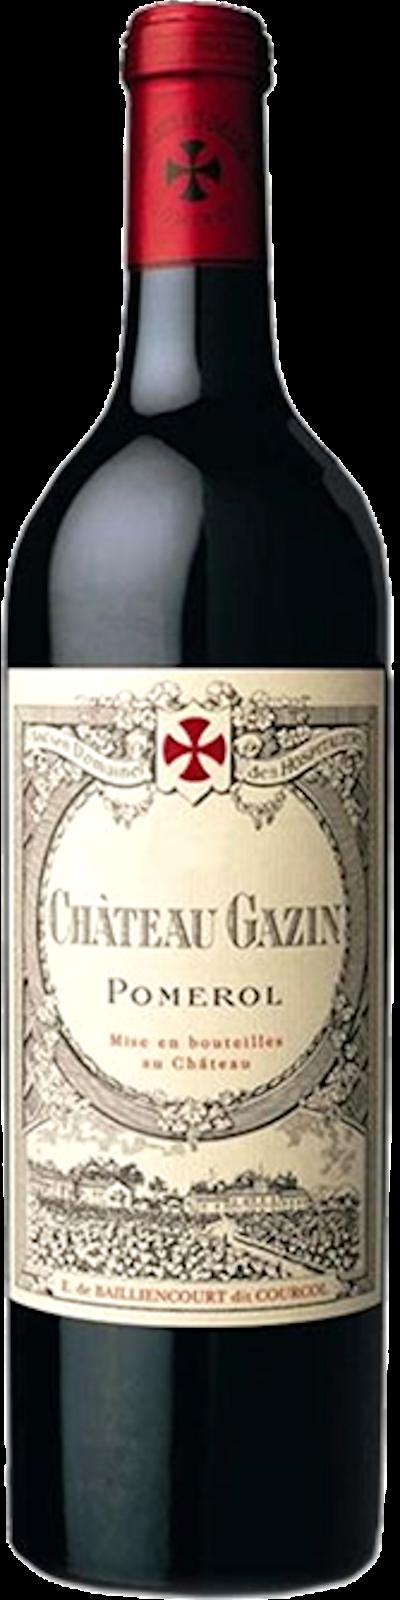 Château Gazin - Pomerol